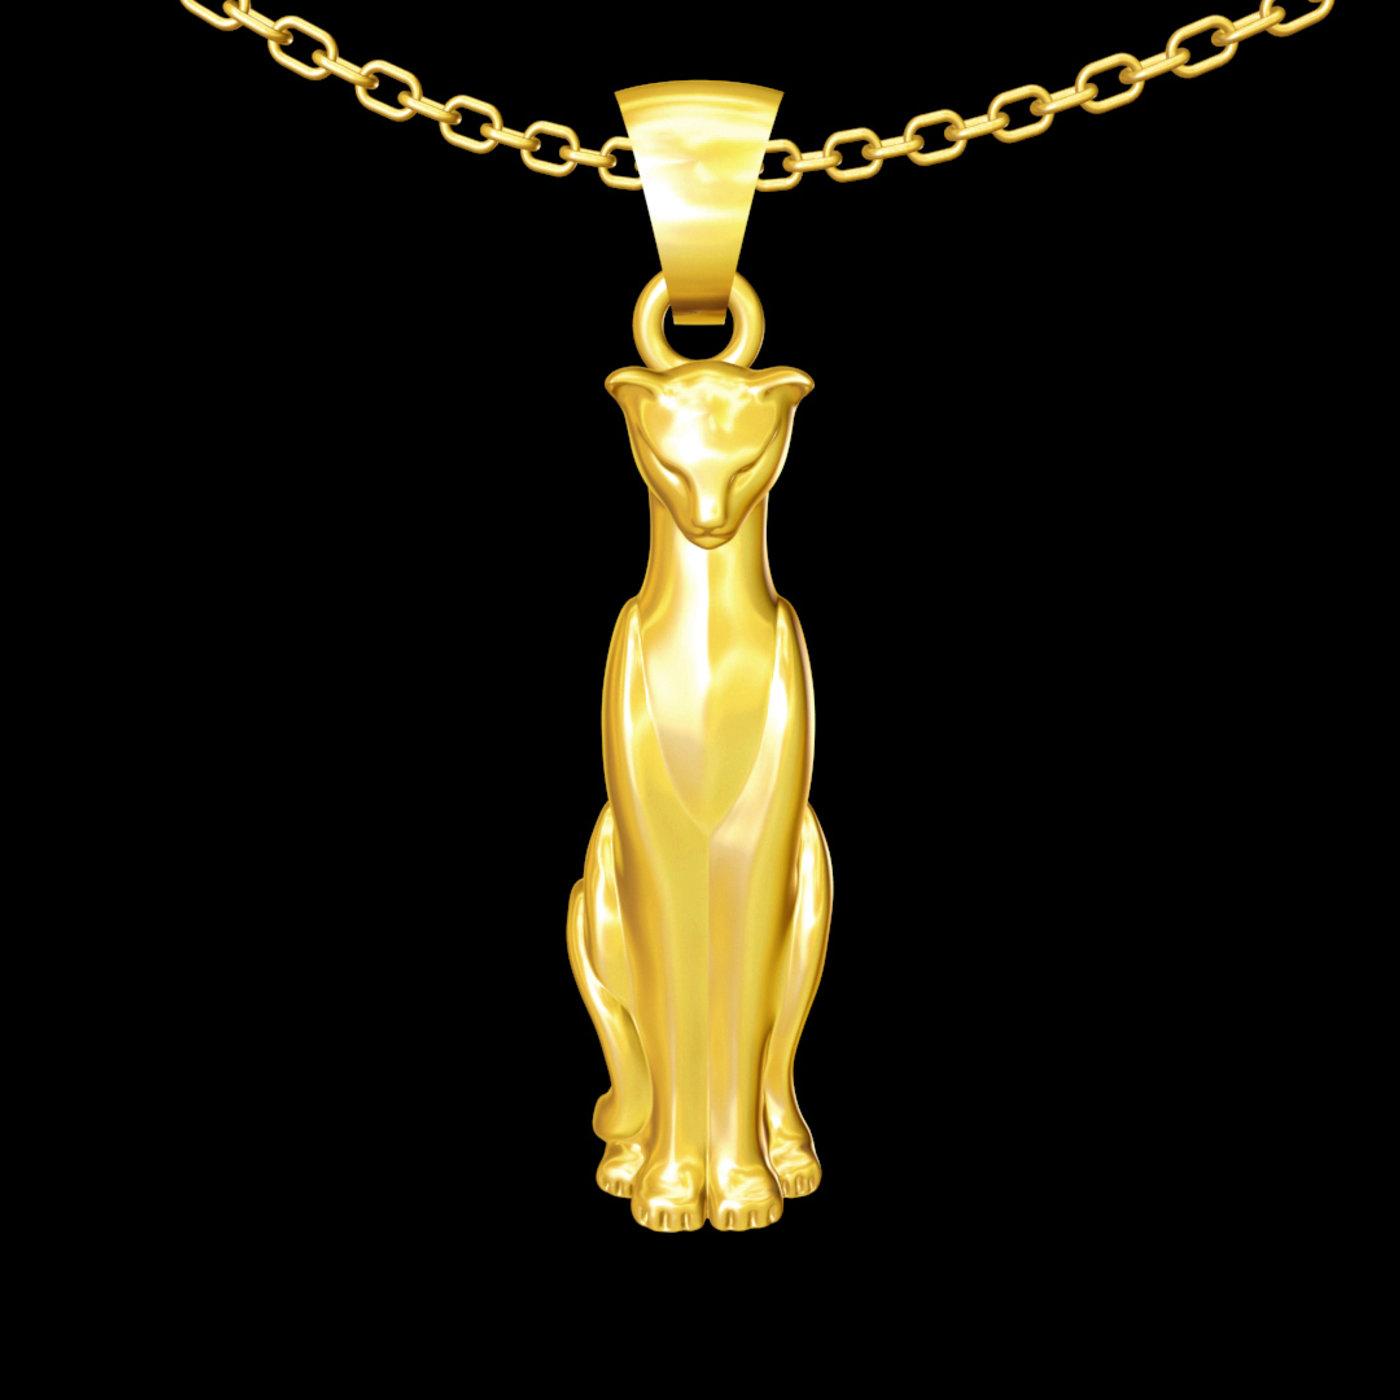 Cat Sculpture pendant jewelry gold necklace 3D print model